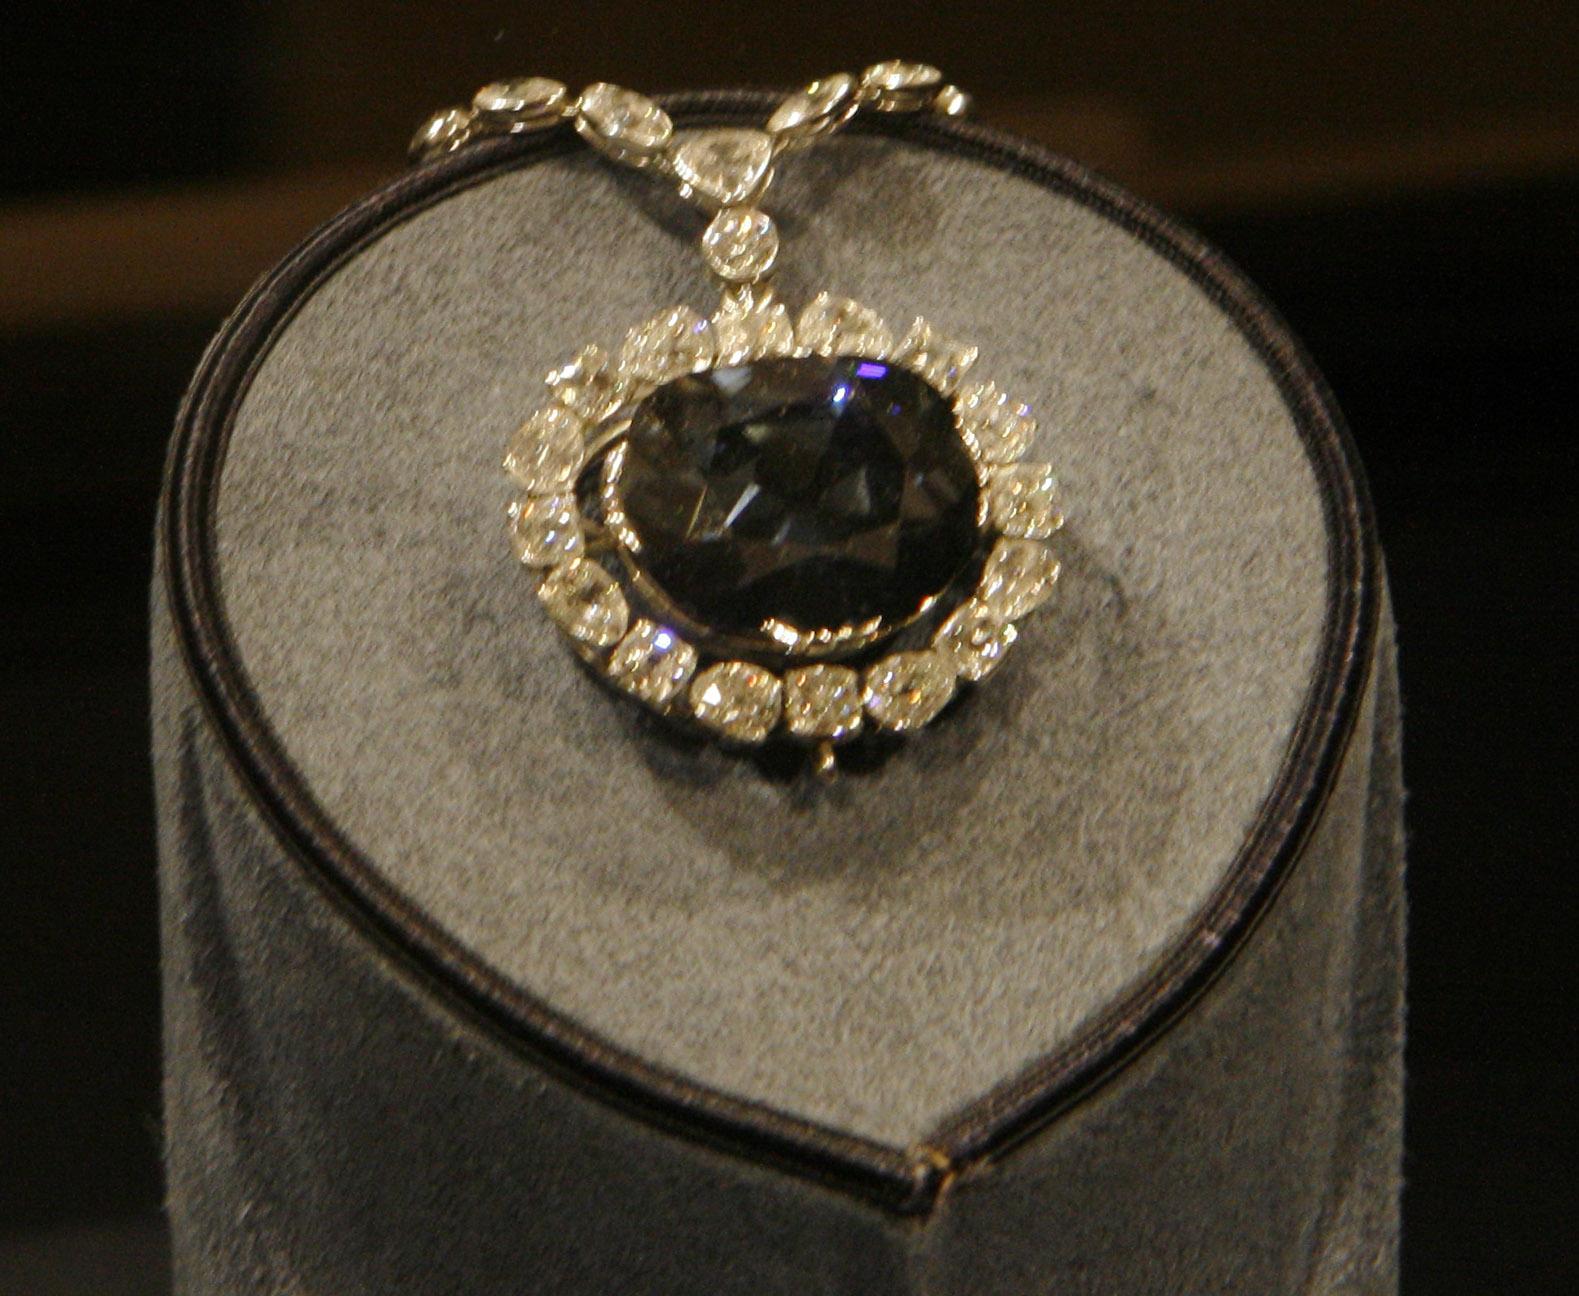 Filethe Hope Diamond 107006041 Wikimedia Commons Mobile Legend 36